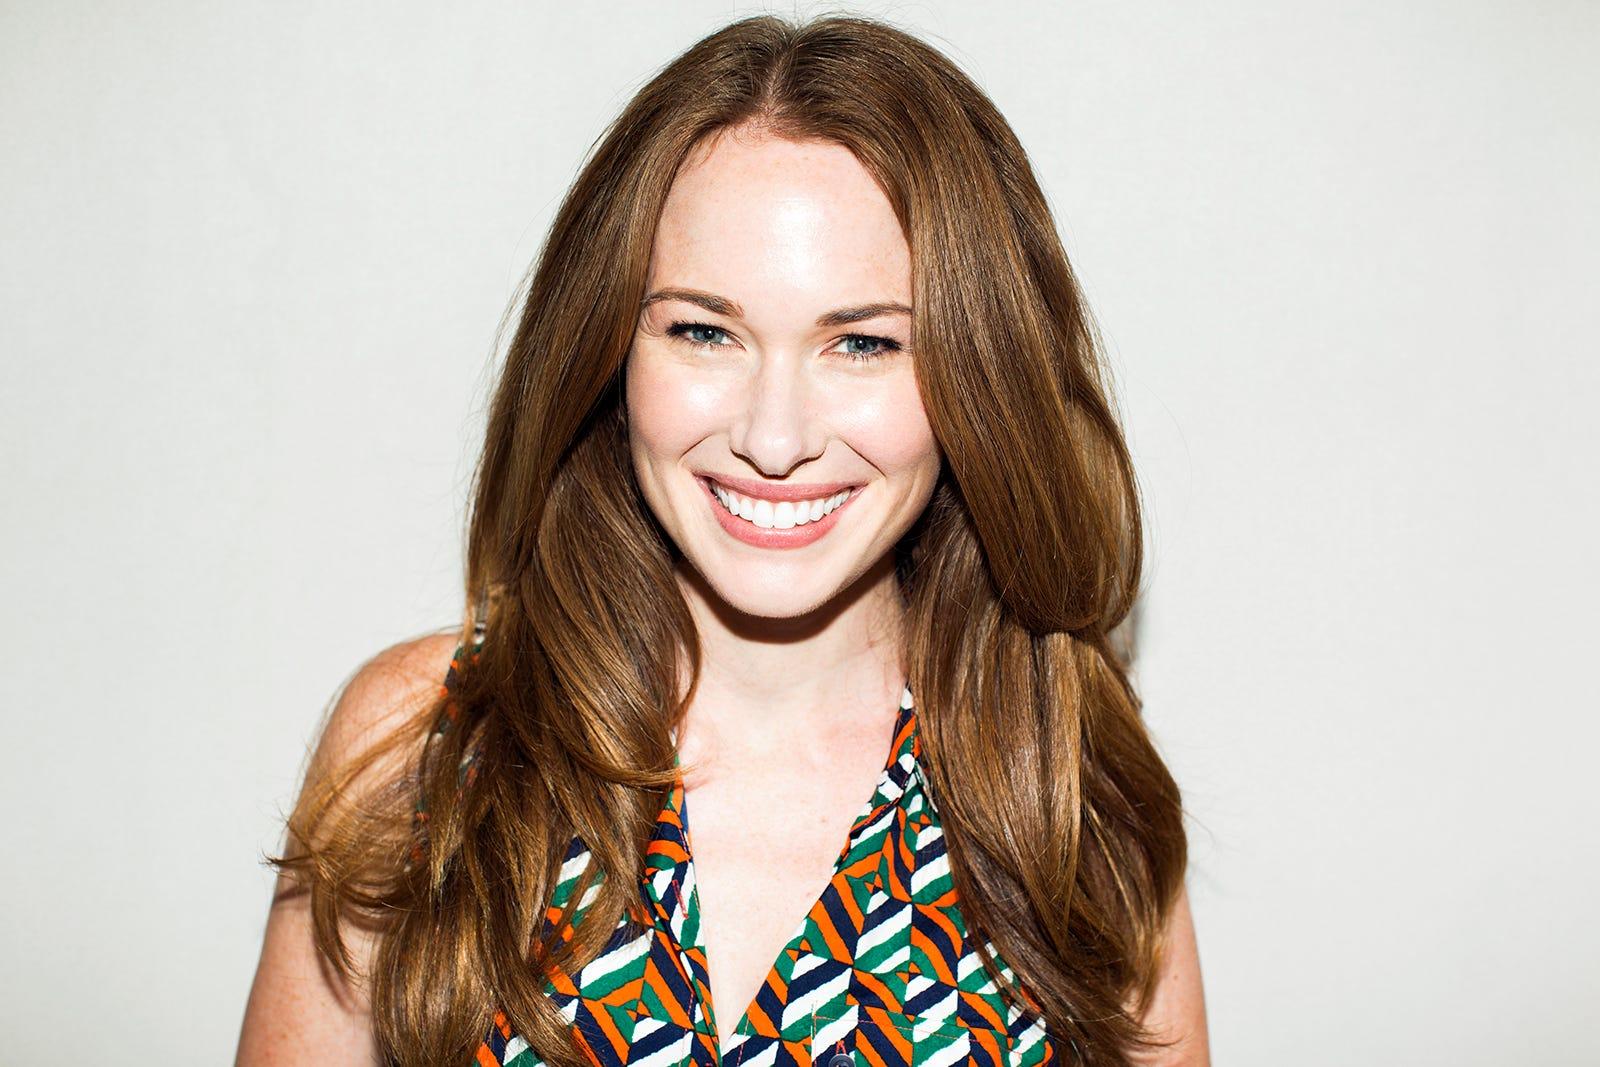 kelly frye quick makeup tips  u2014 mac cosmetics